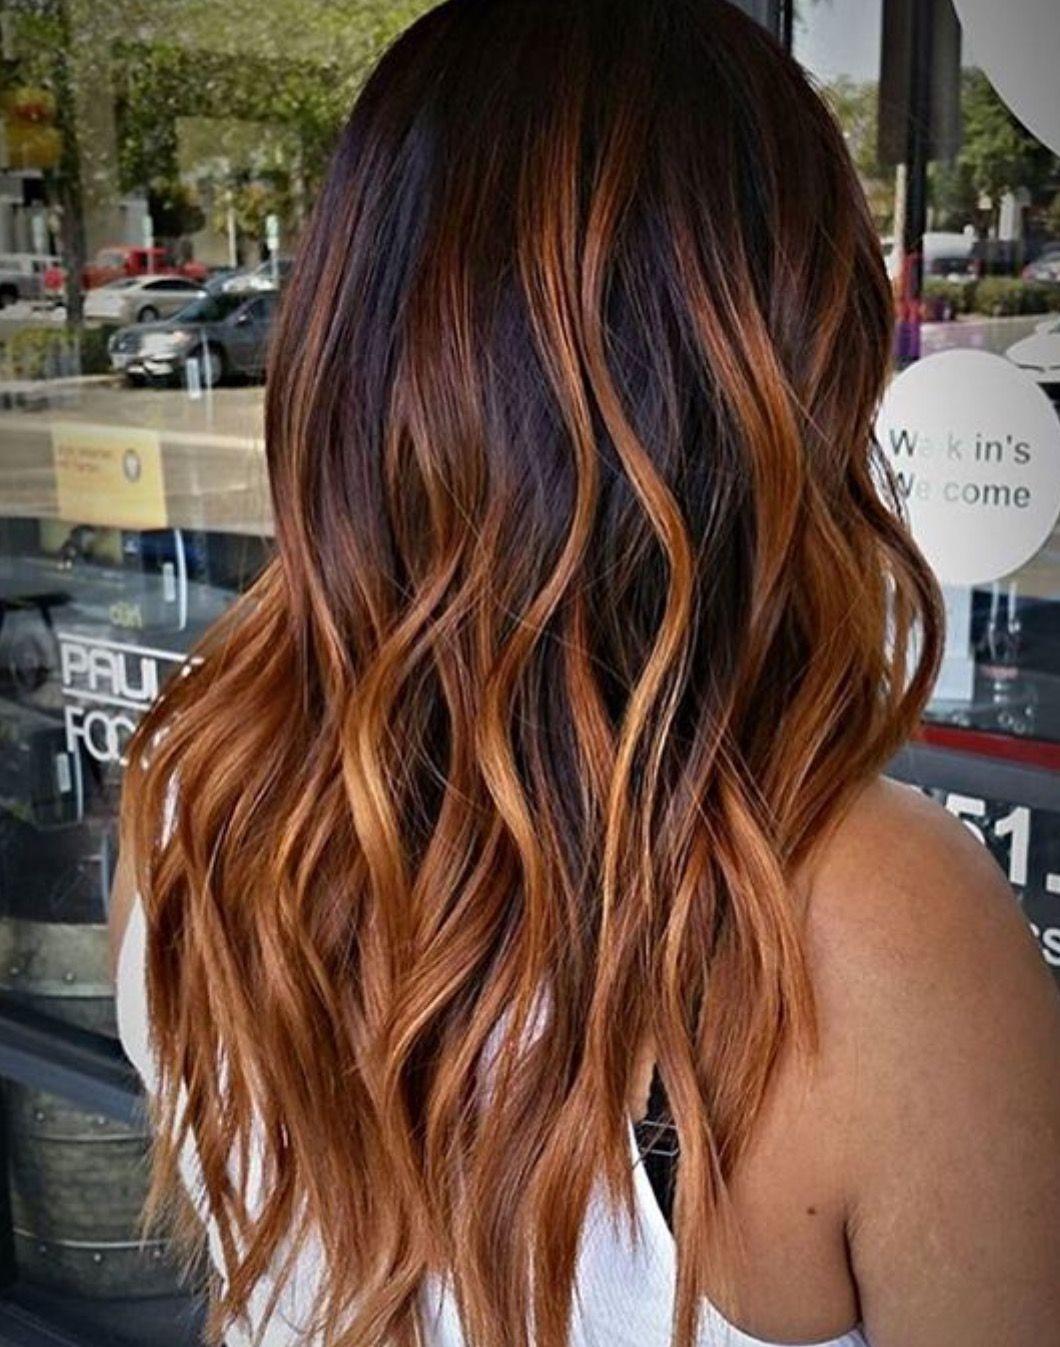 Pin By Megan Wallen On Hair Hair Color Balayage Balayage Hair